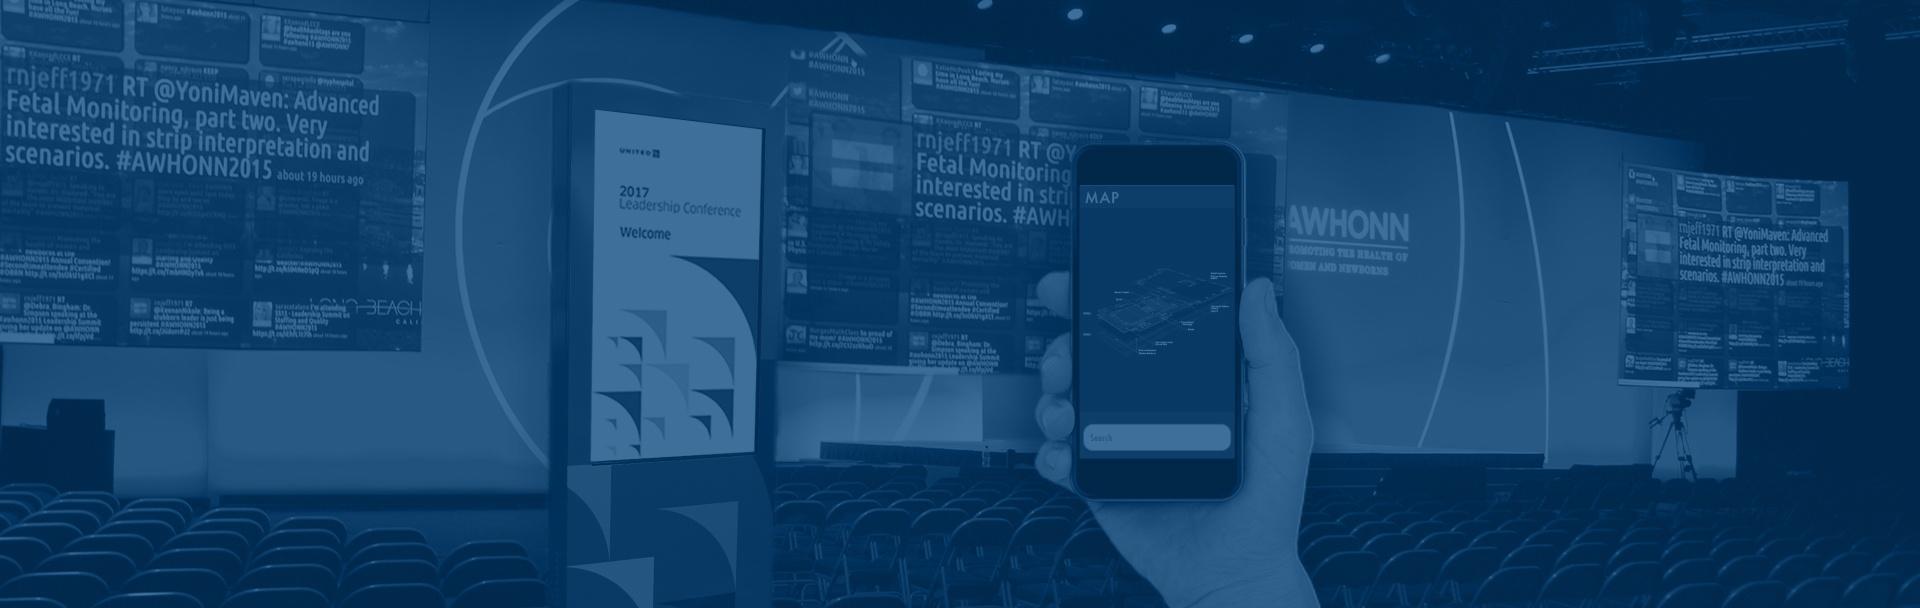 LSAV PowerHouse Live Blog Digital Signage_d2 20171221 Banner.jpg